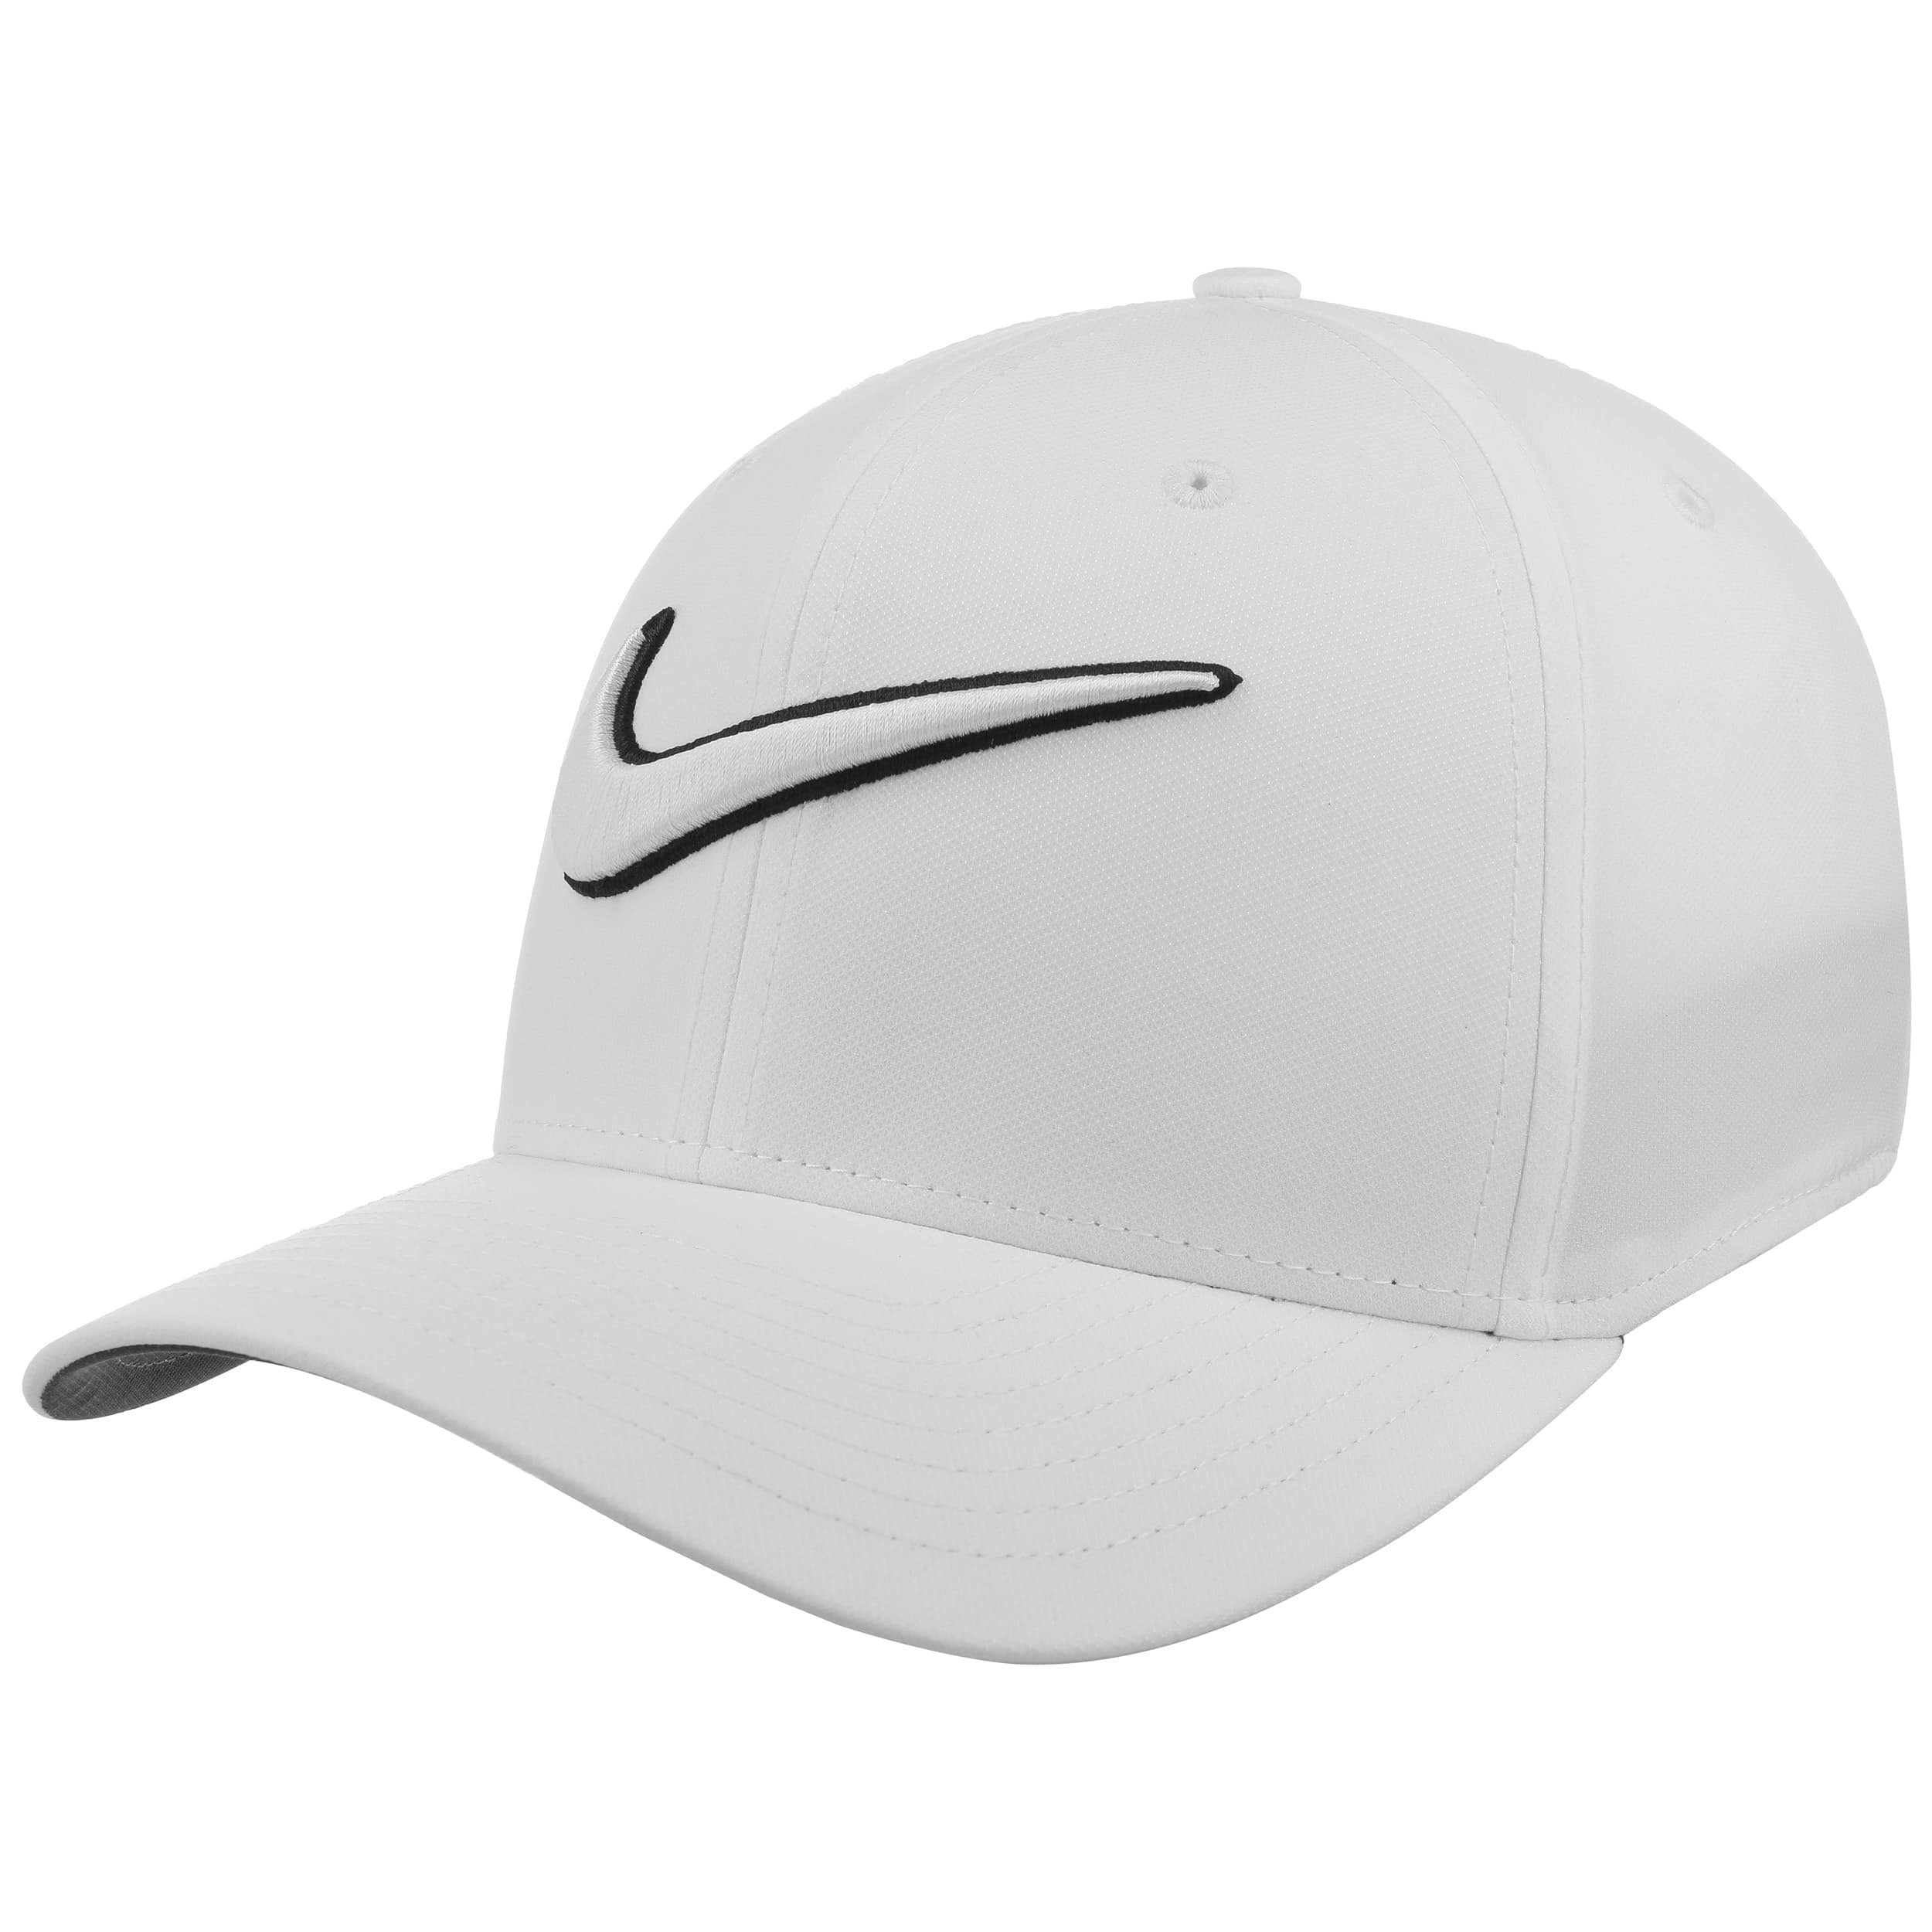 5f0a4a81bef2 Gorra Golf Classic 99 Performance by Nike